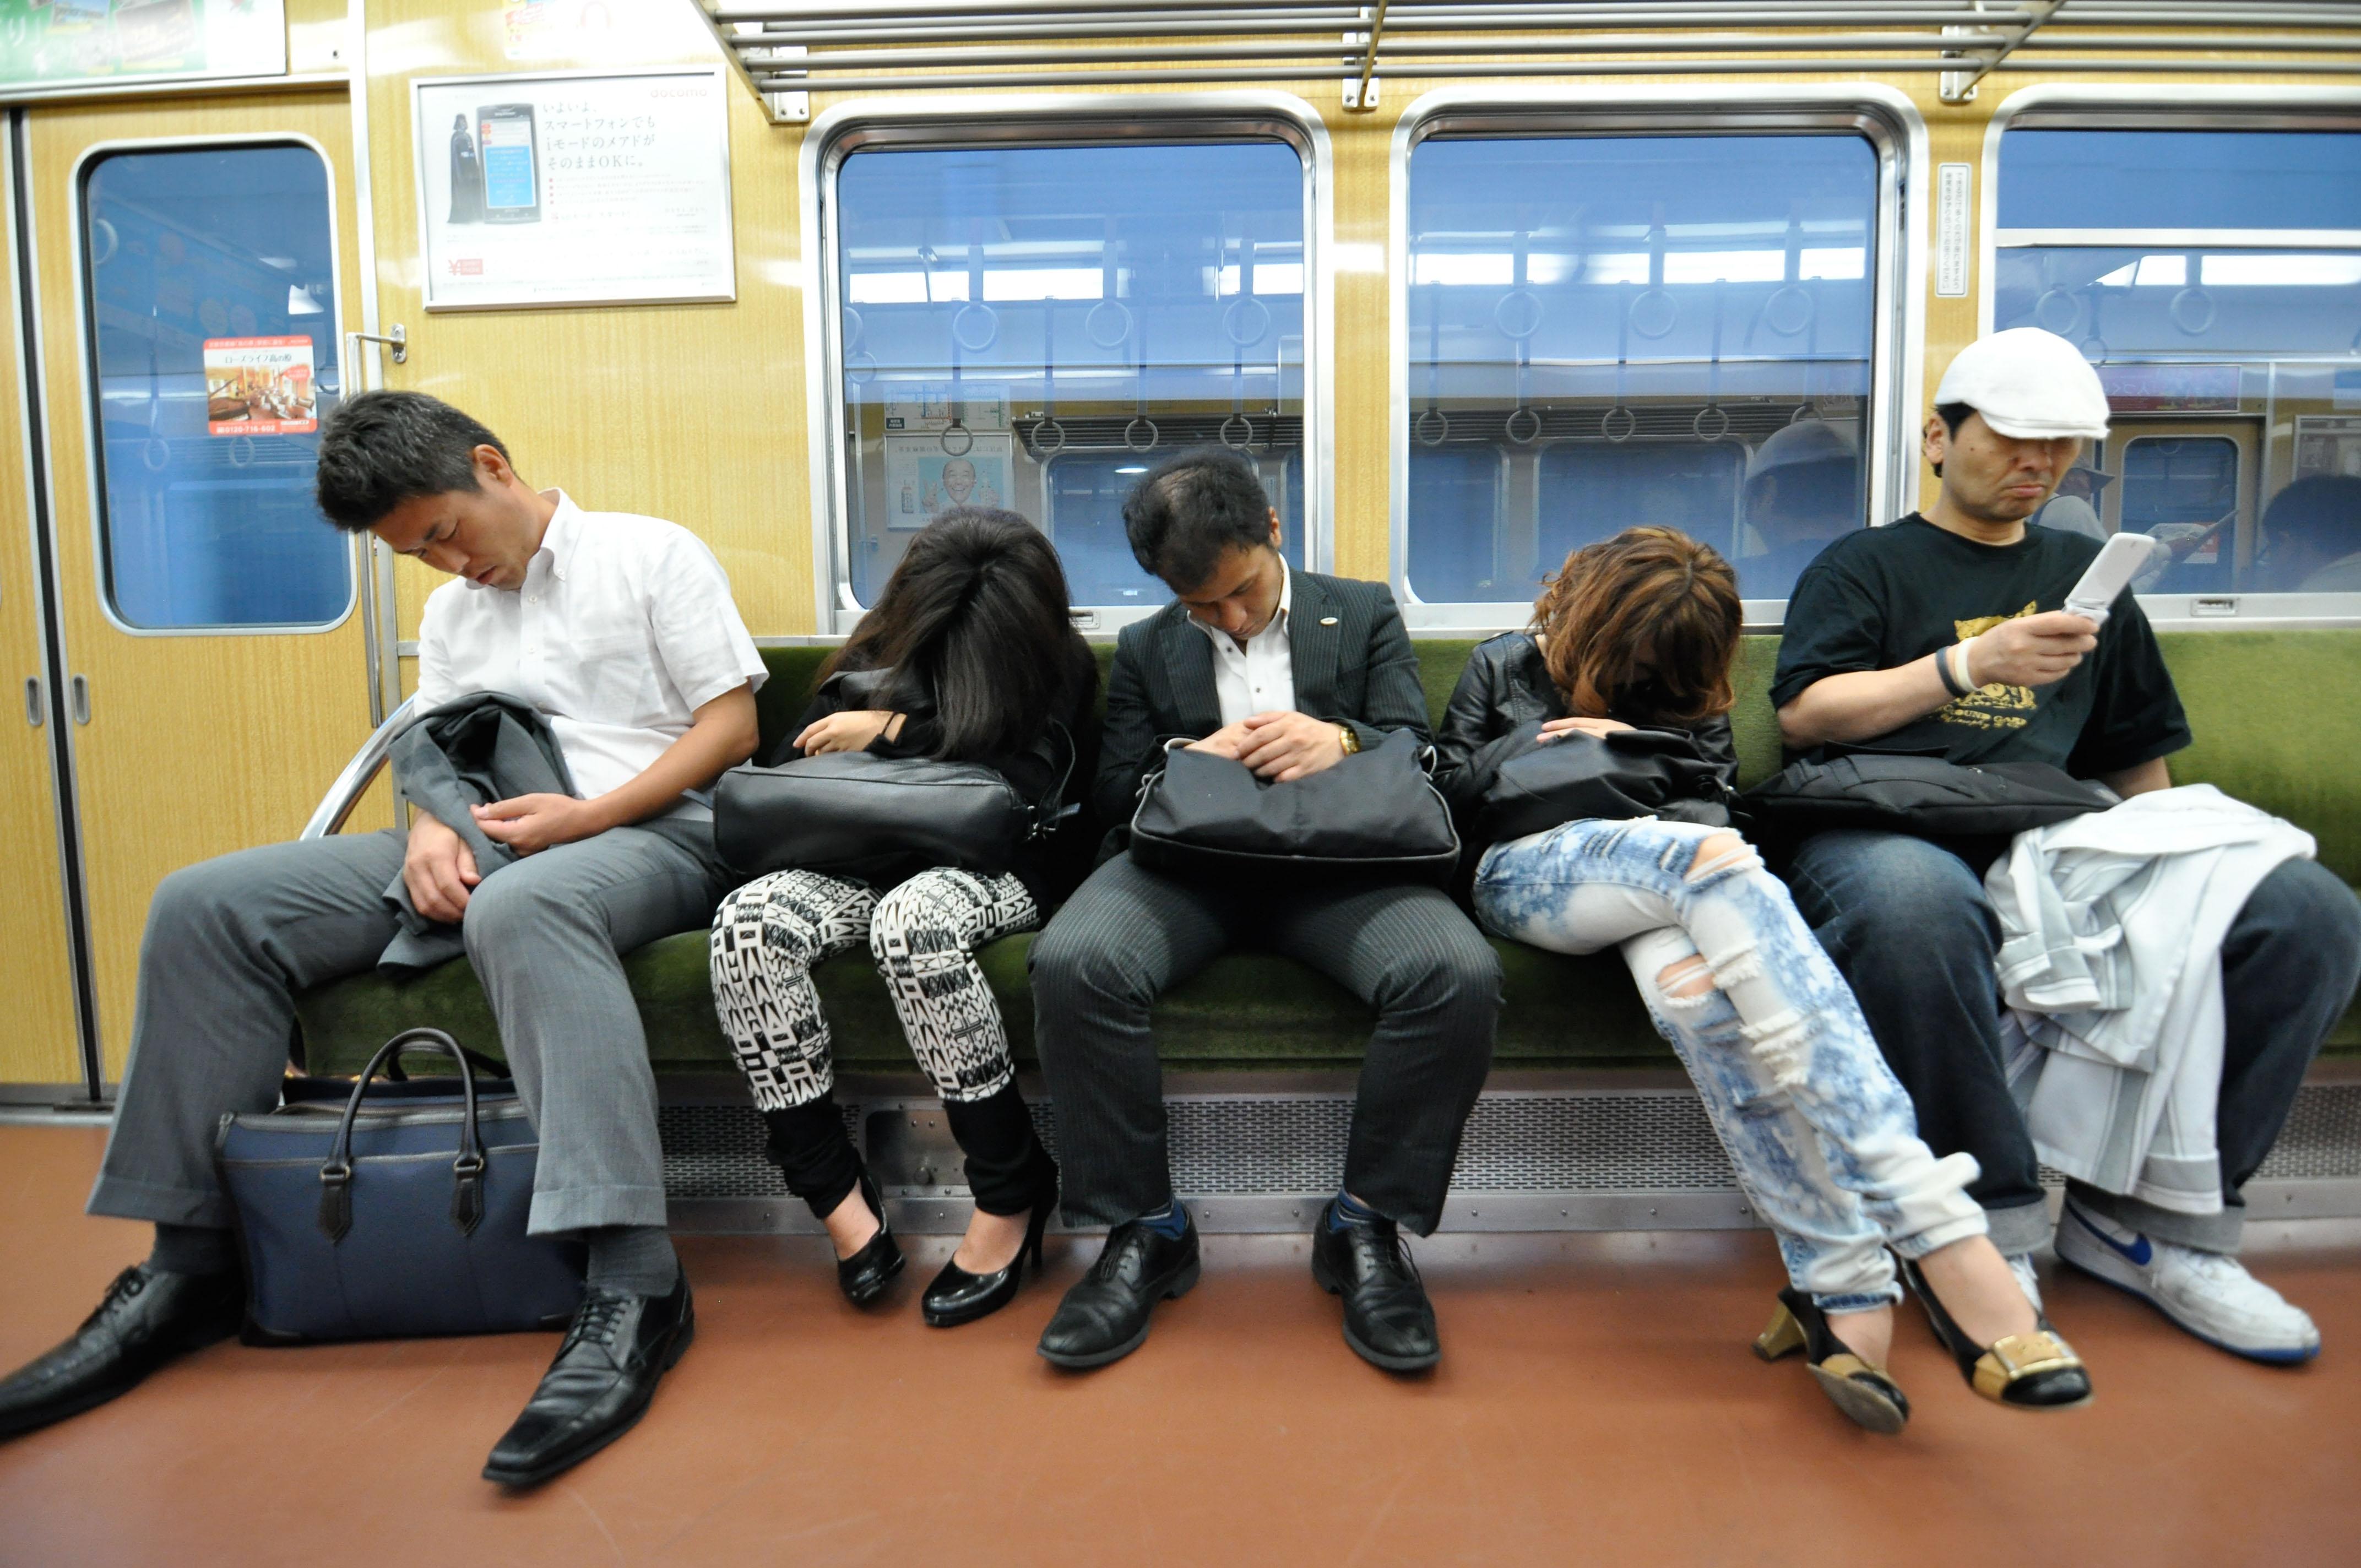 Why do Japanese people sleep on trains?